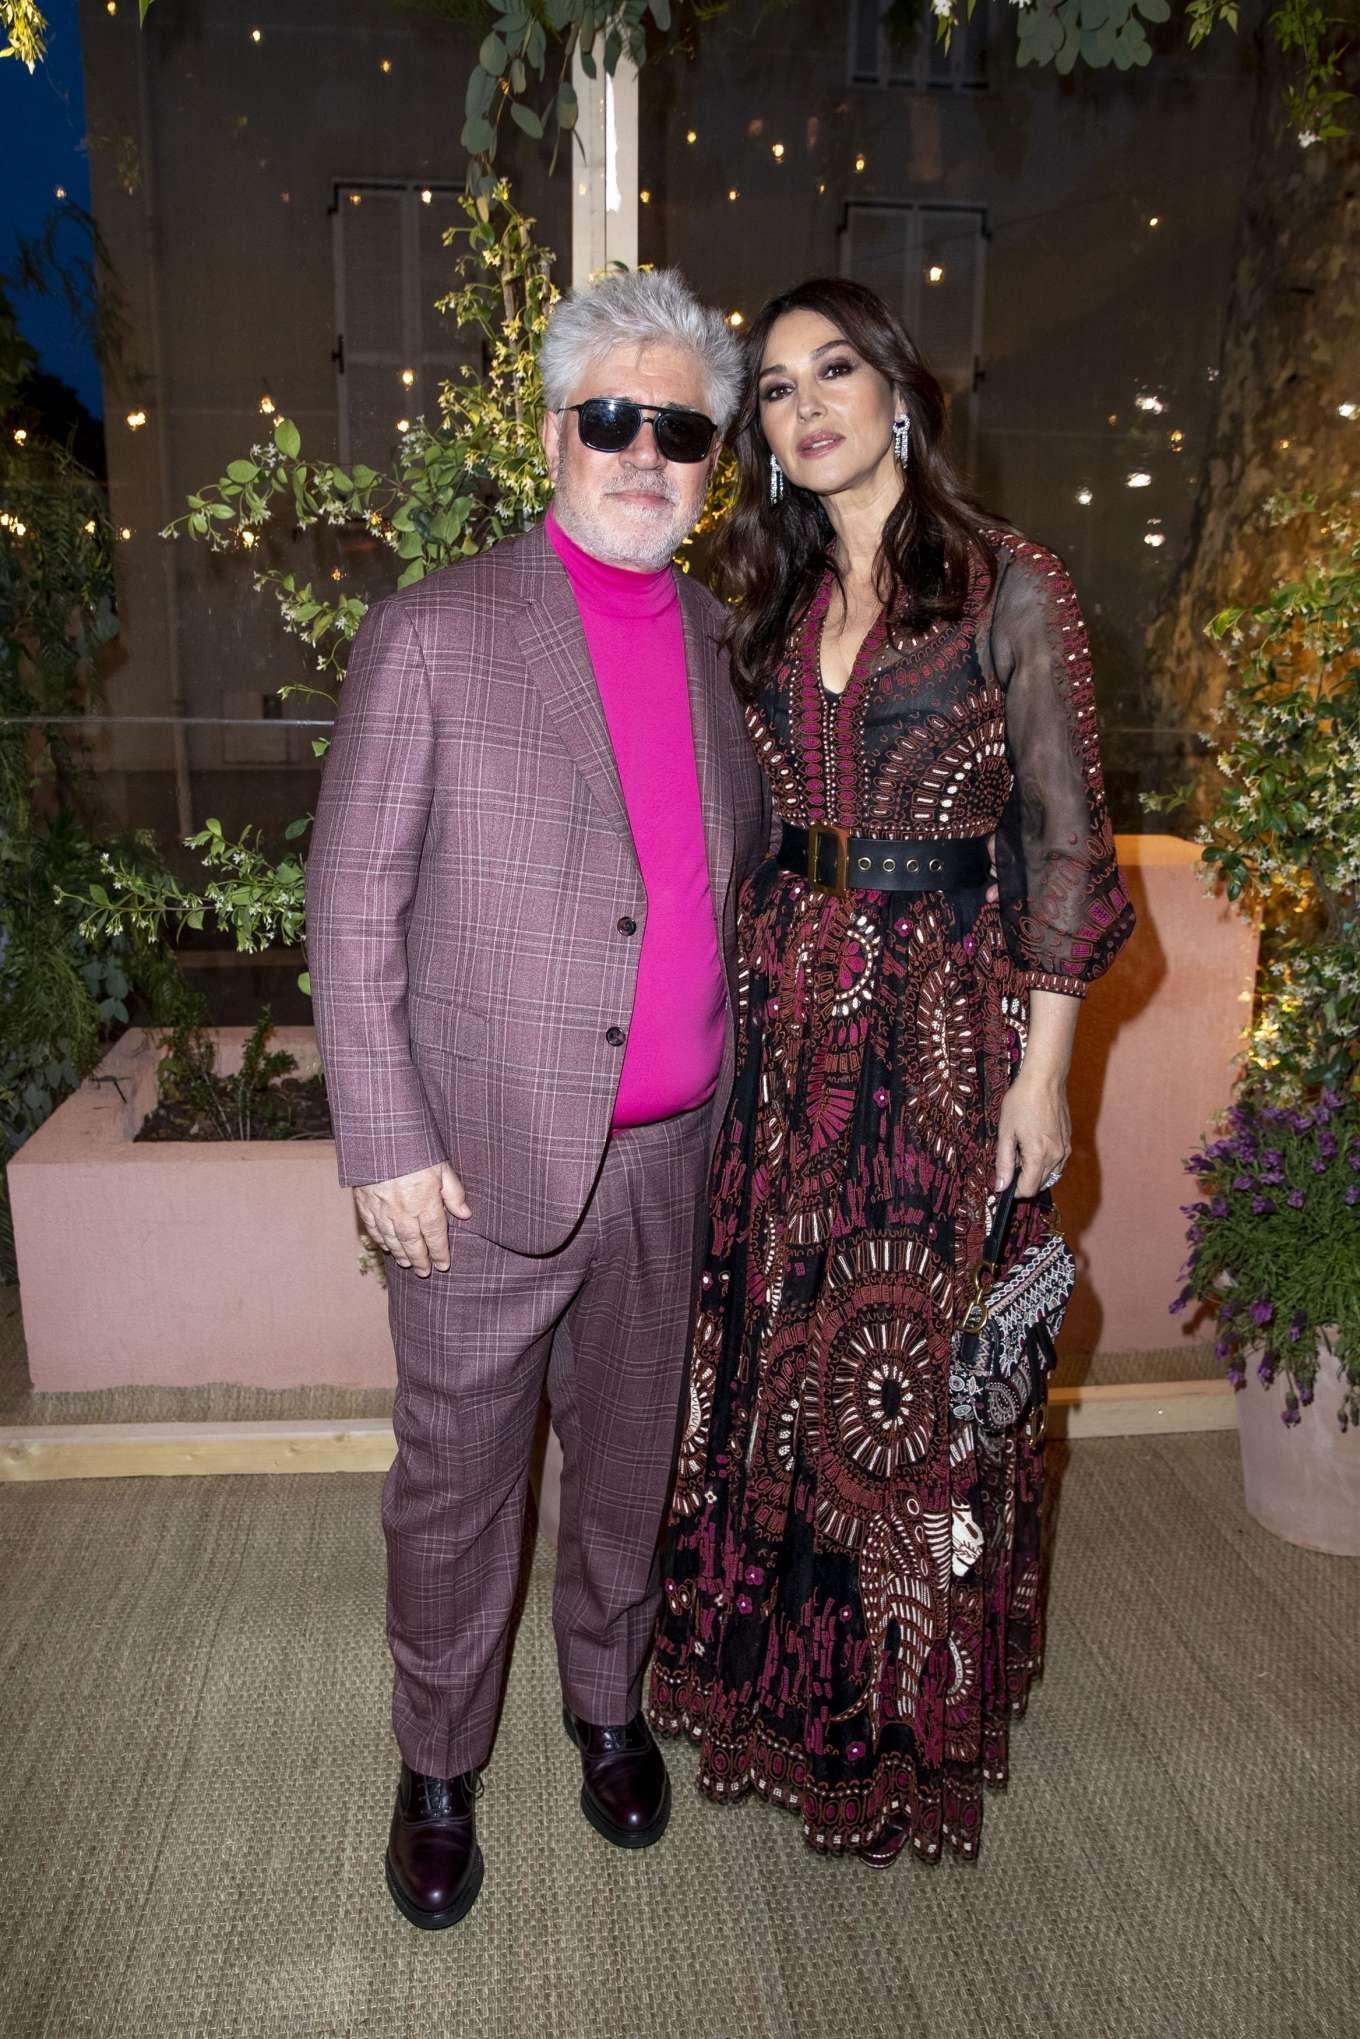 Monica Bellucci 2019 : Monica Bellucci: Dior x Vogue Party at 2019 Cannes Film Festival-04